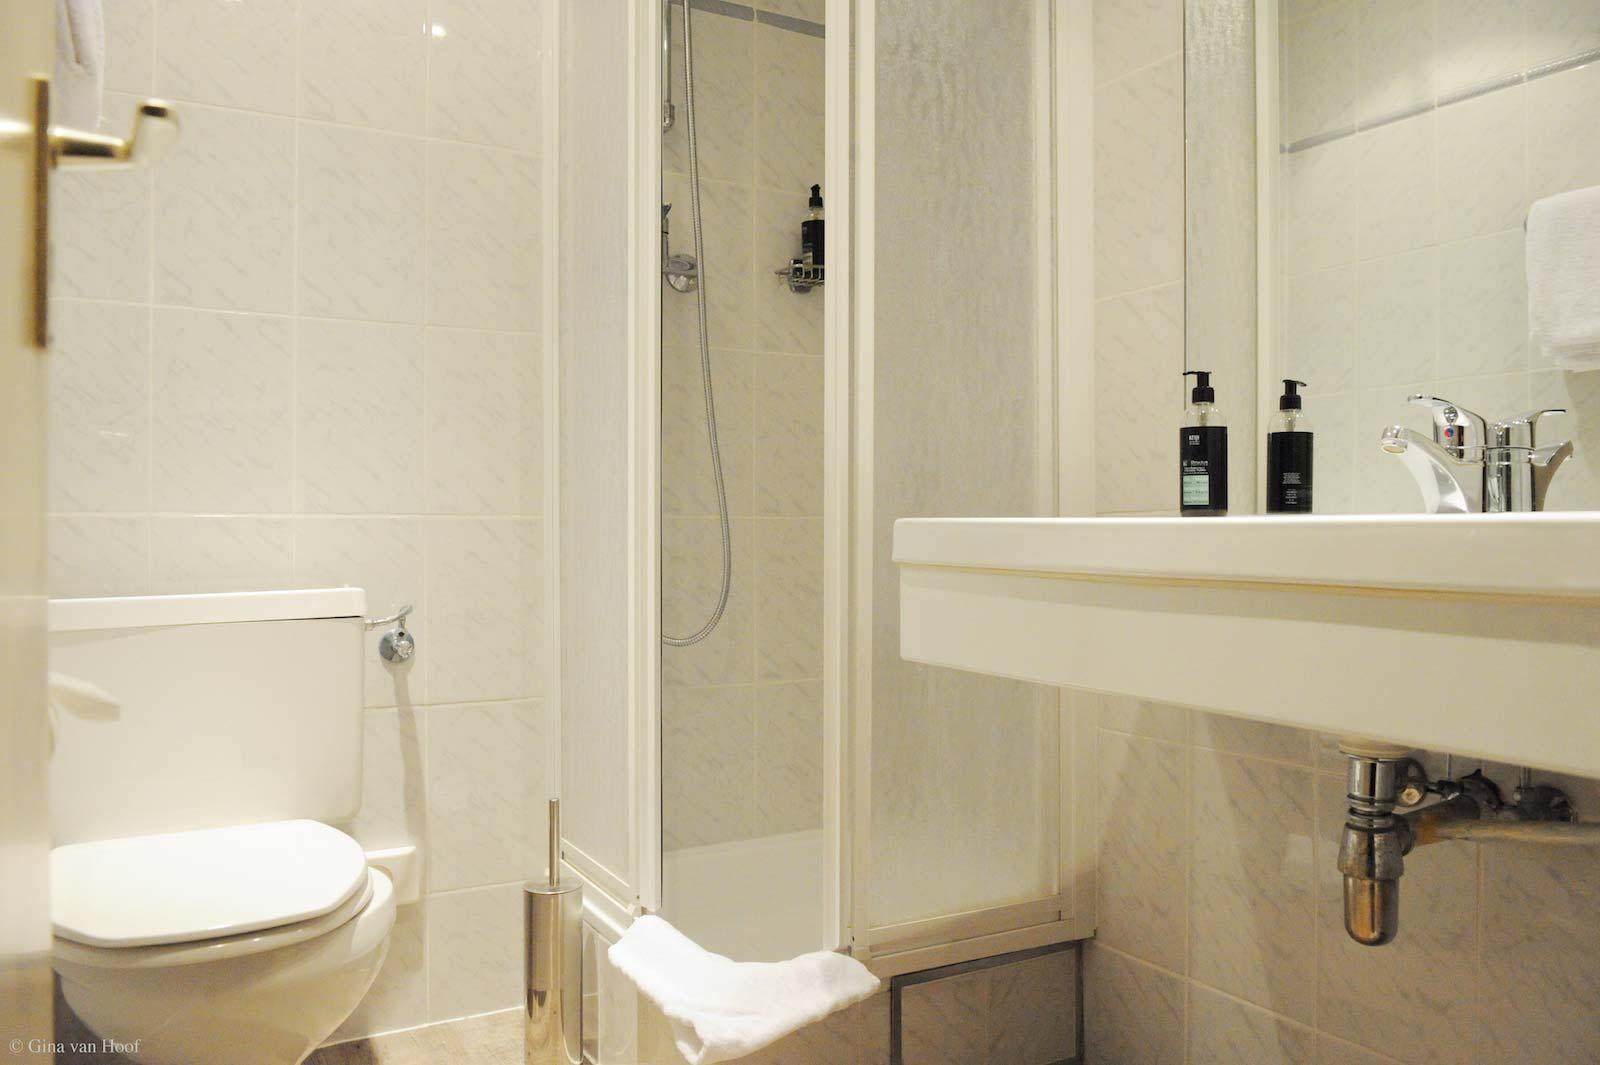 hotel-chelton-rooms-standard-single-bathroom.jpg